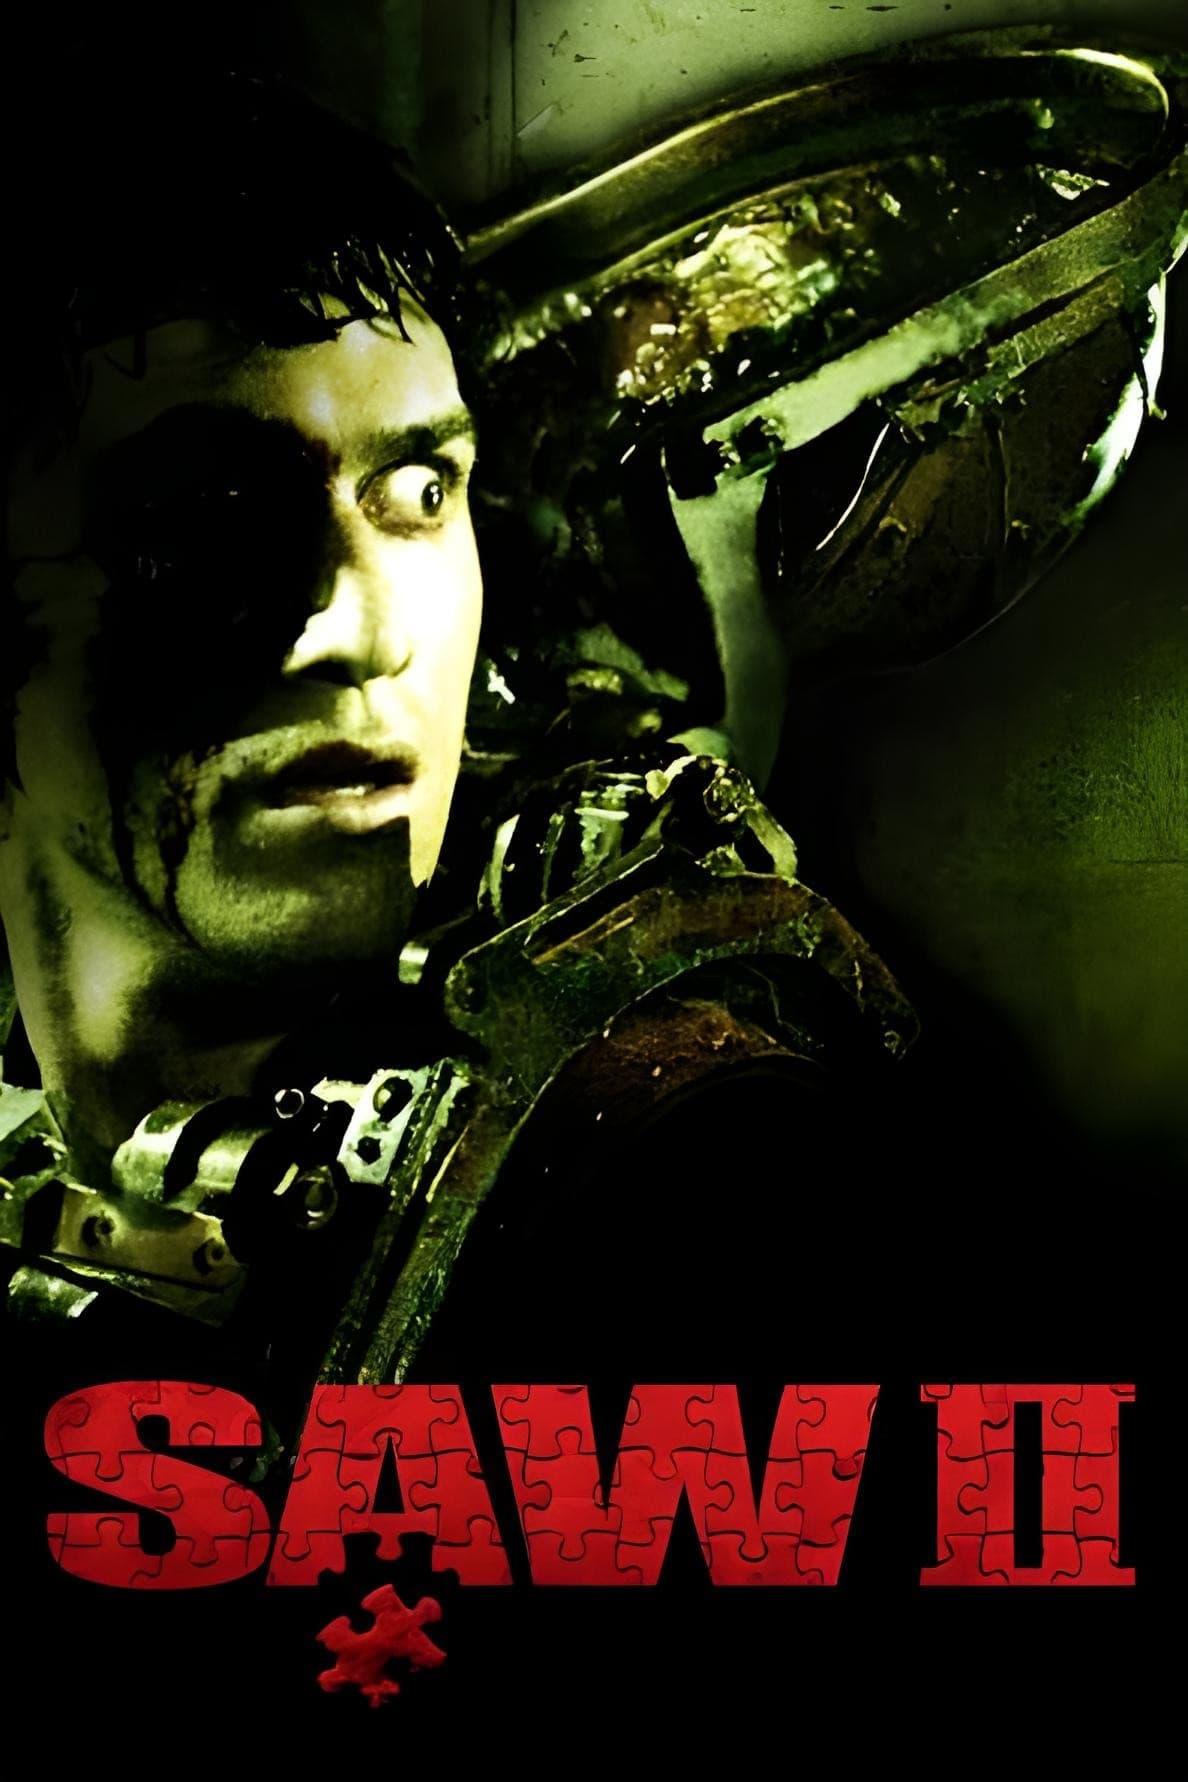 Saw II - A Experiência do Medo